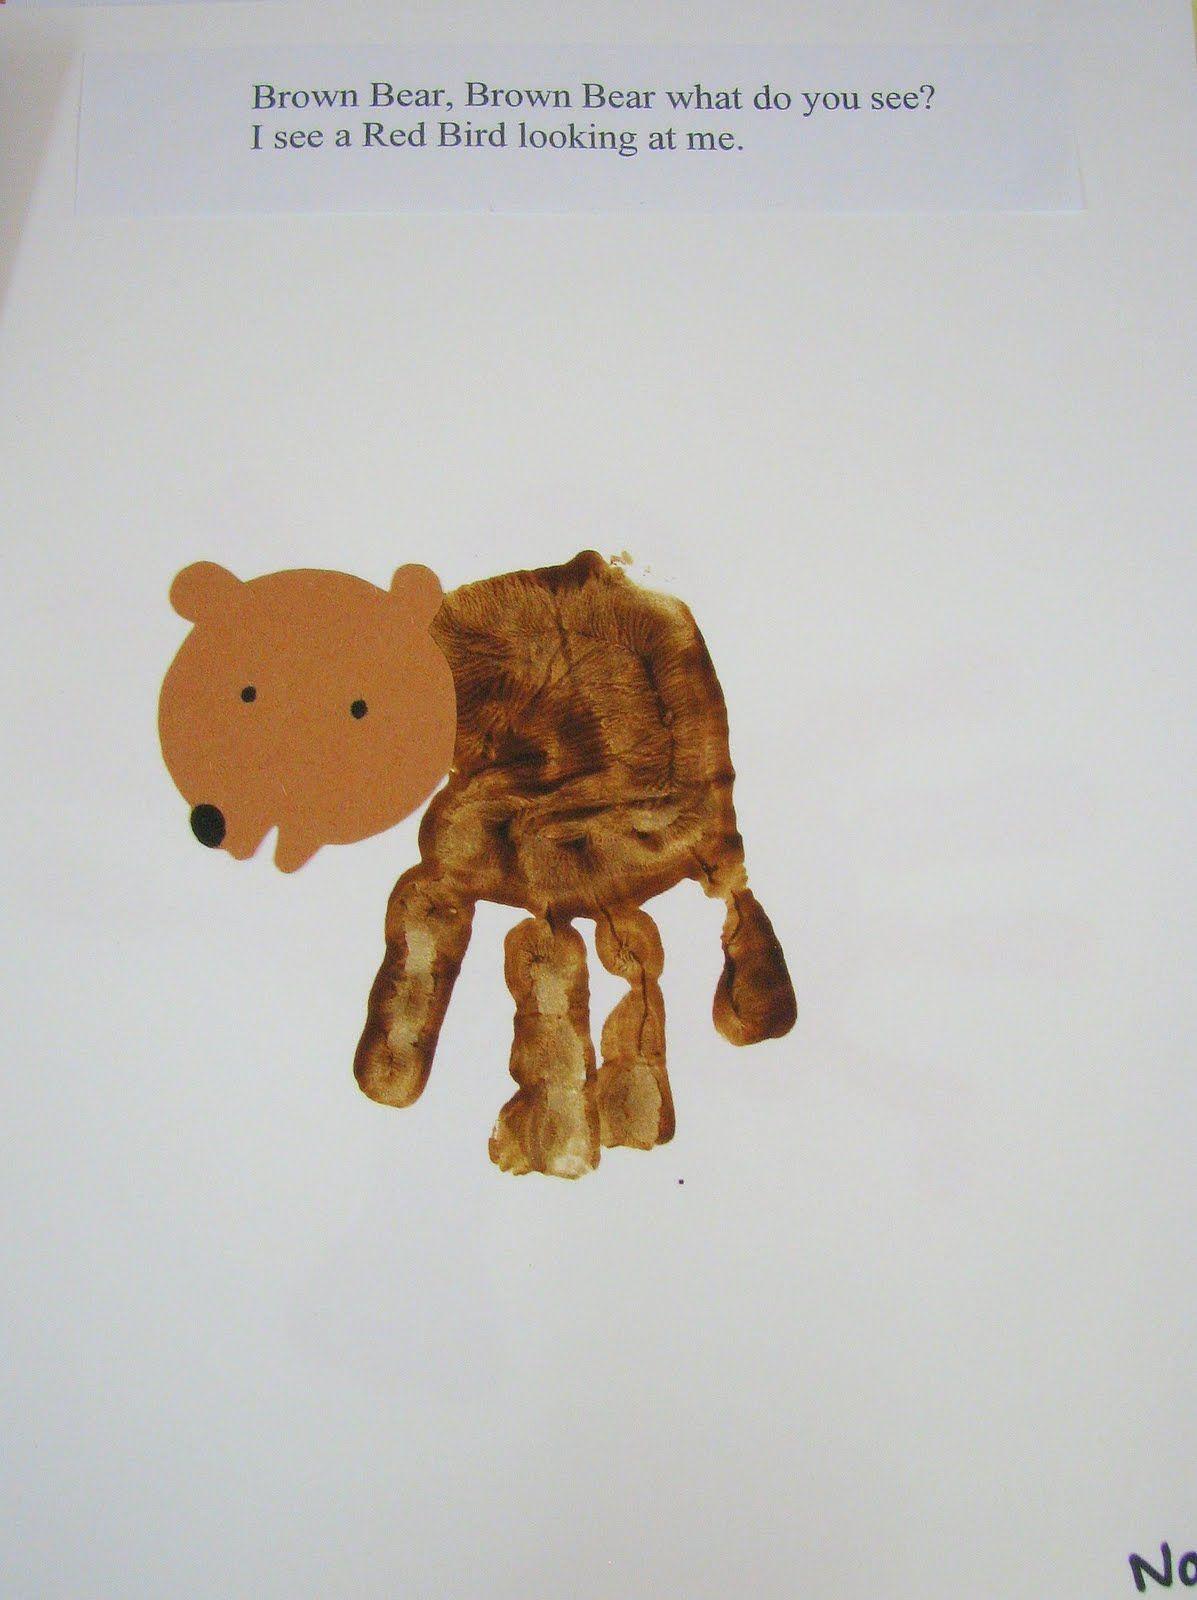 Brown Bear Hand Print Book